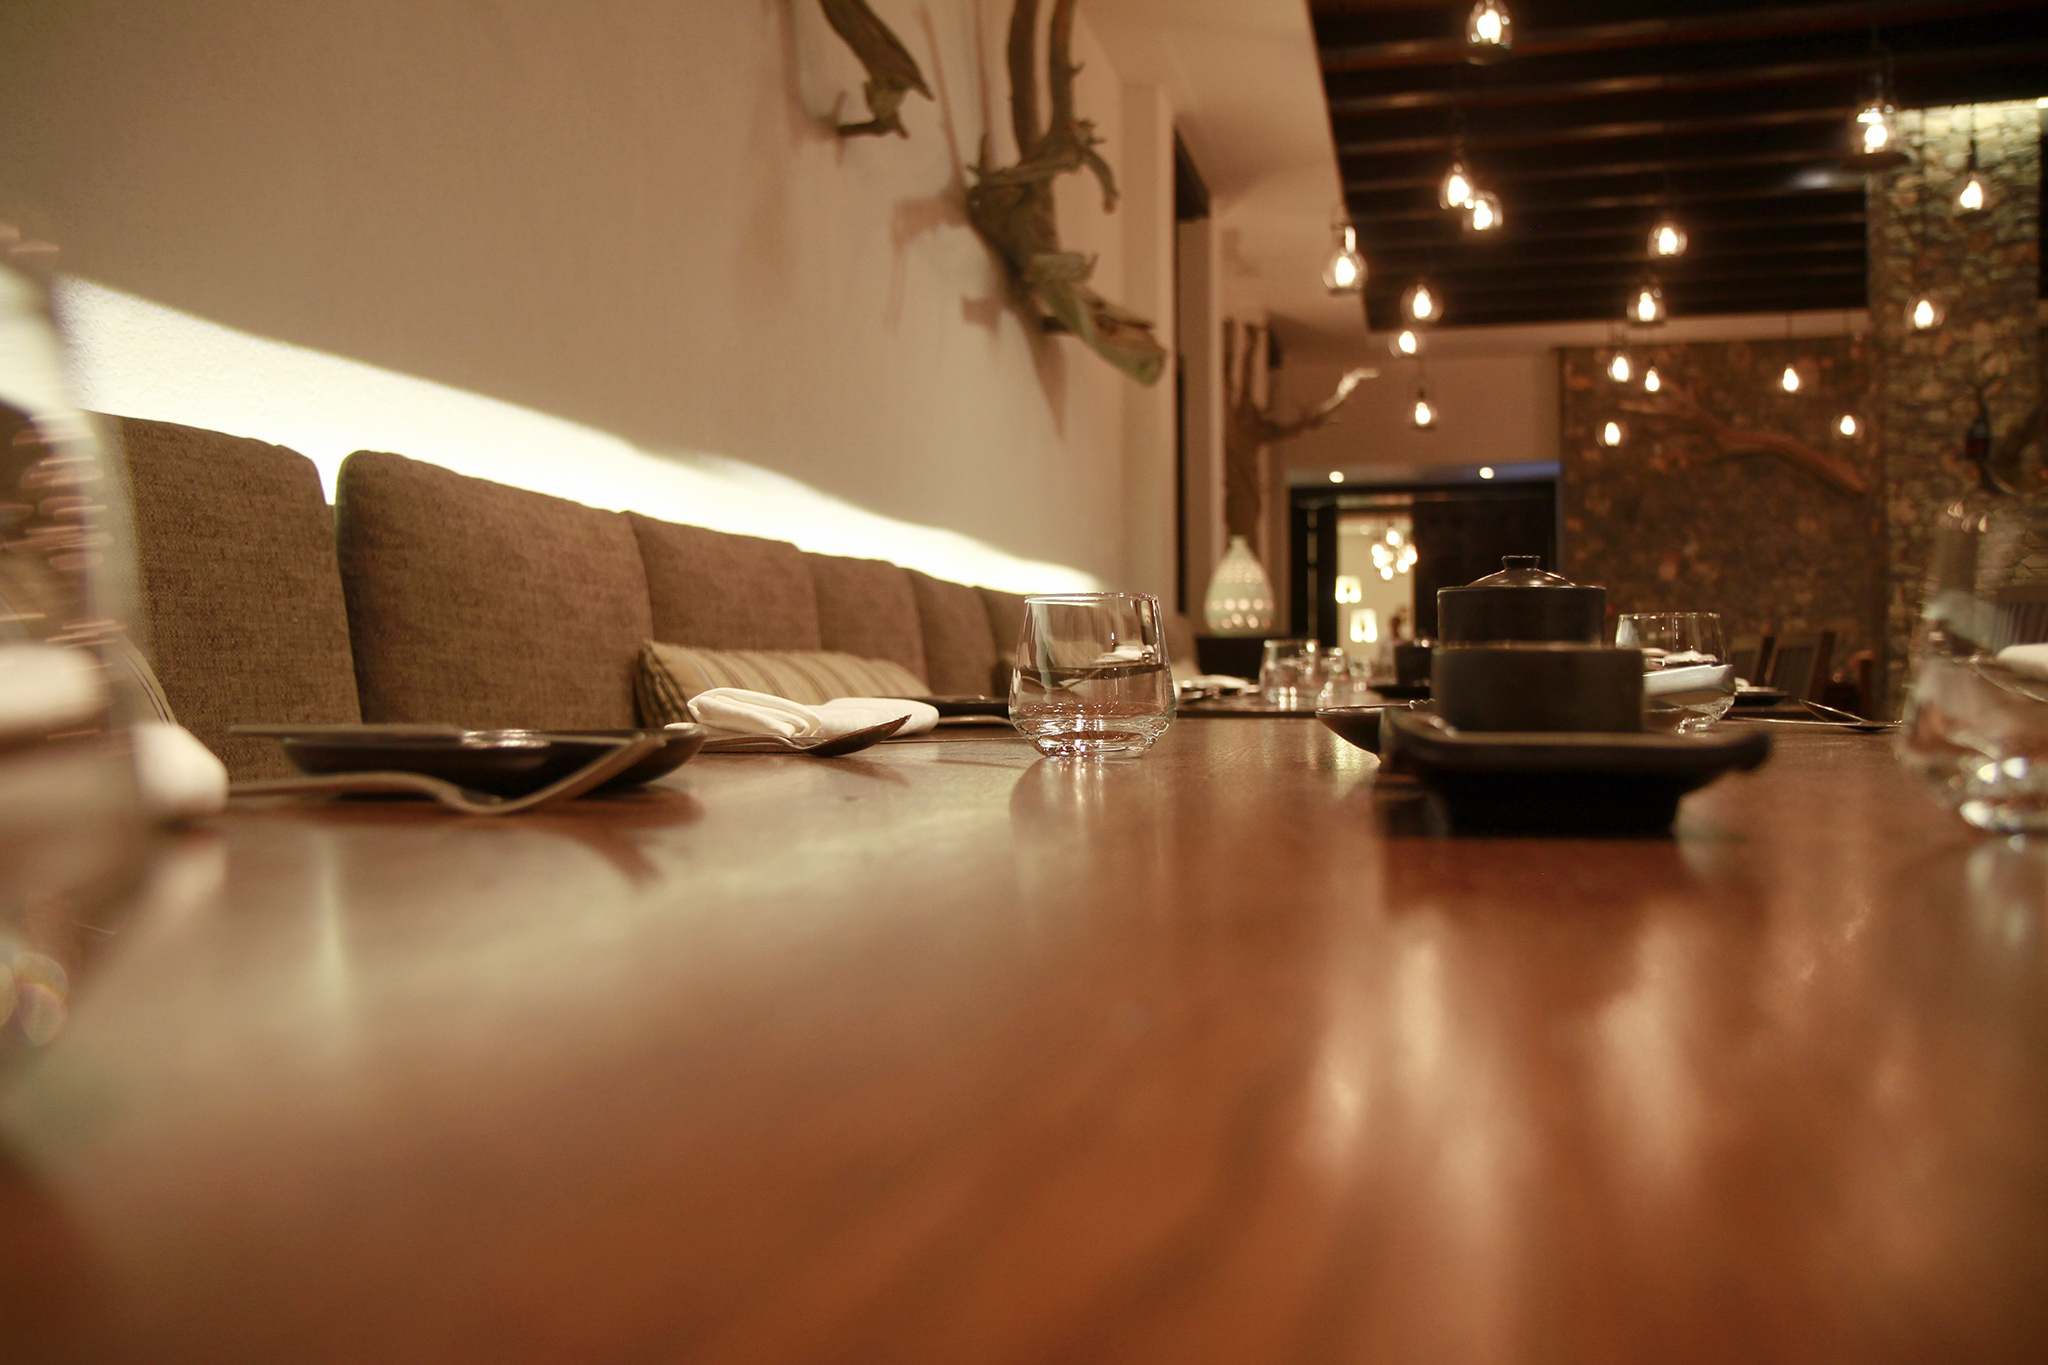 2017-04-Alila-Jabal-Akhdar - alila-jabal-akhdar-oman-nectarandpulse-restaurant-5.jpg